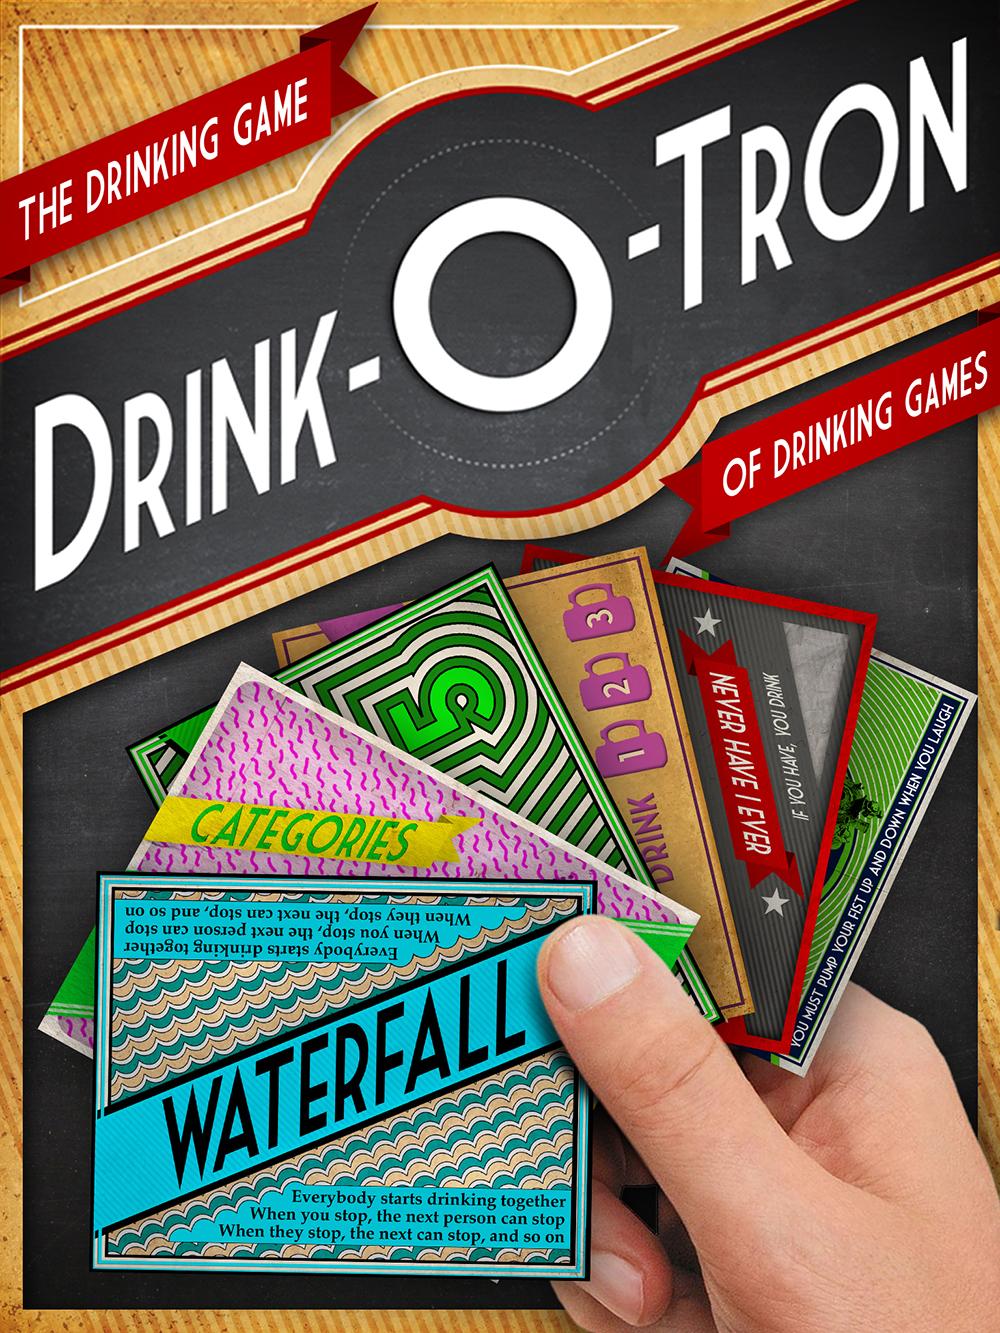 drinkotron.jpg